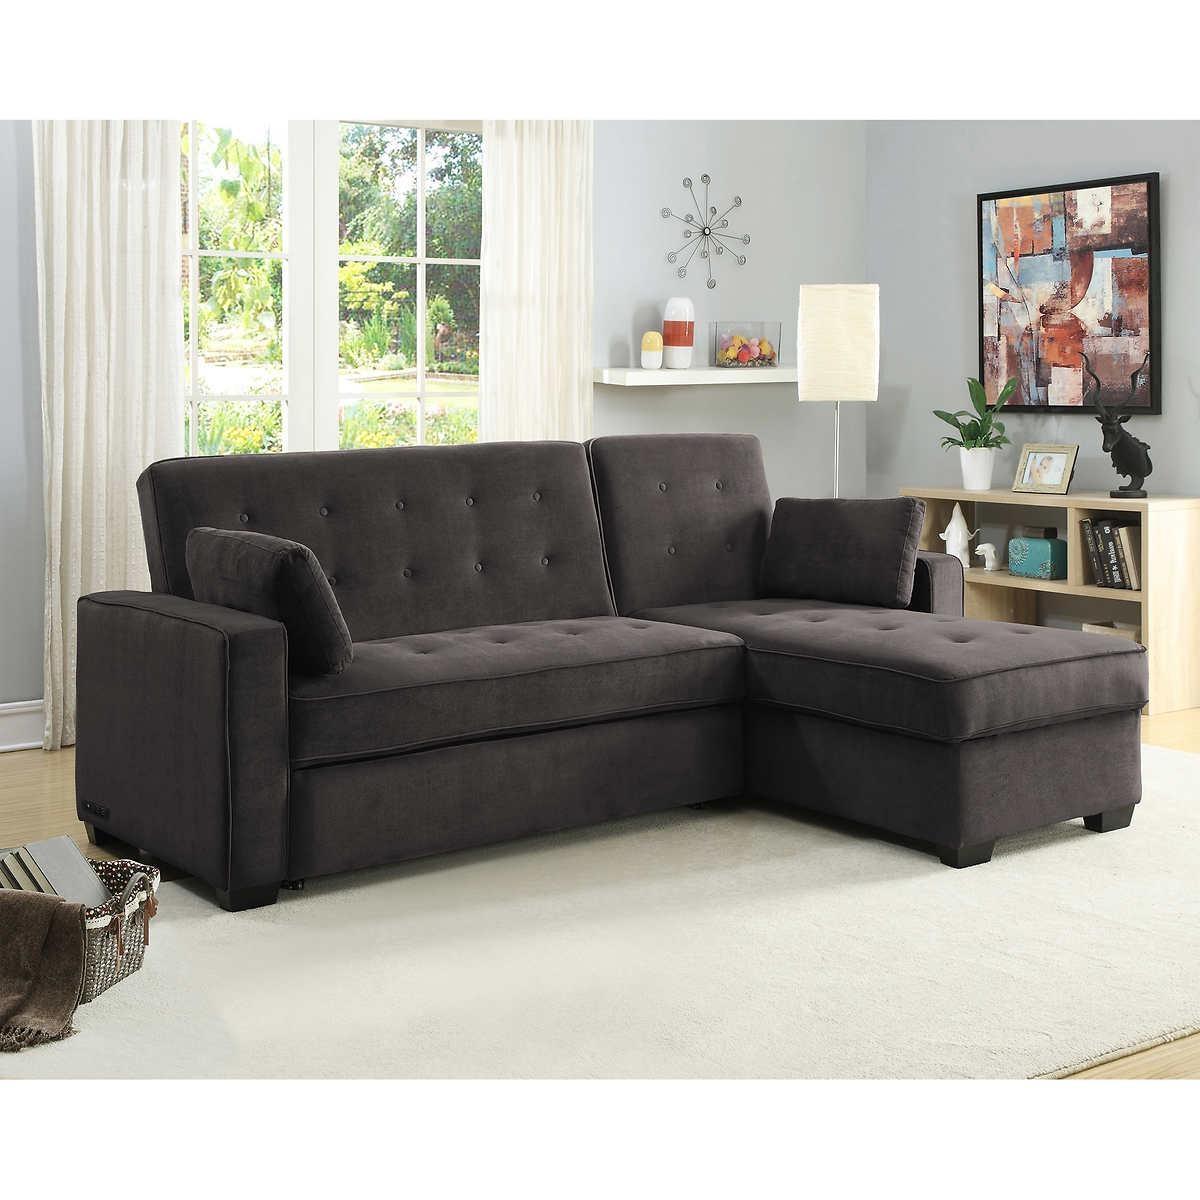 berkline leather sofa reviews carolina sofas 2018 latest   ideas